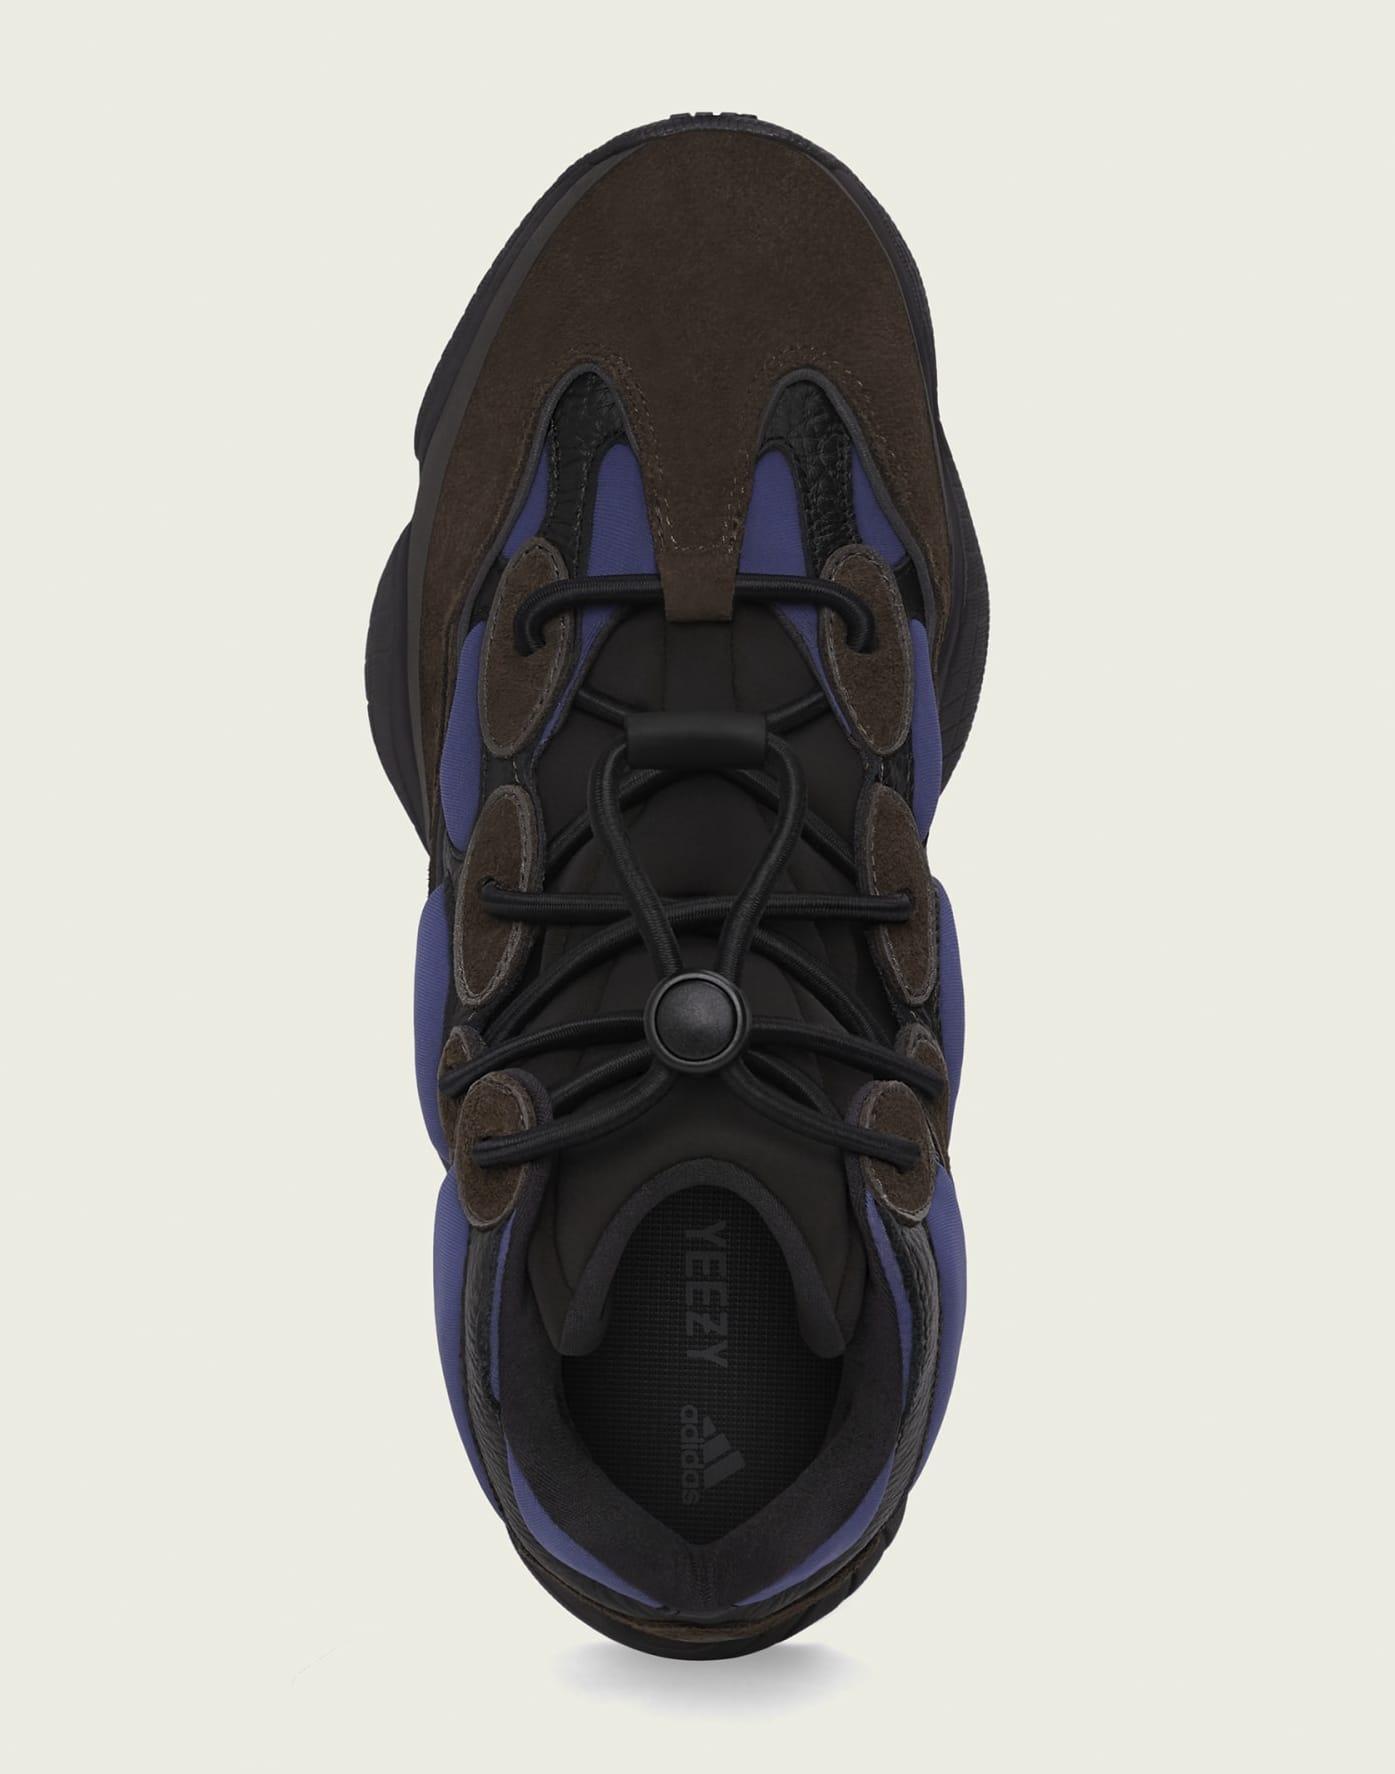 Adidas Yeezy 500 High 'Tyrian' FY4269 Top